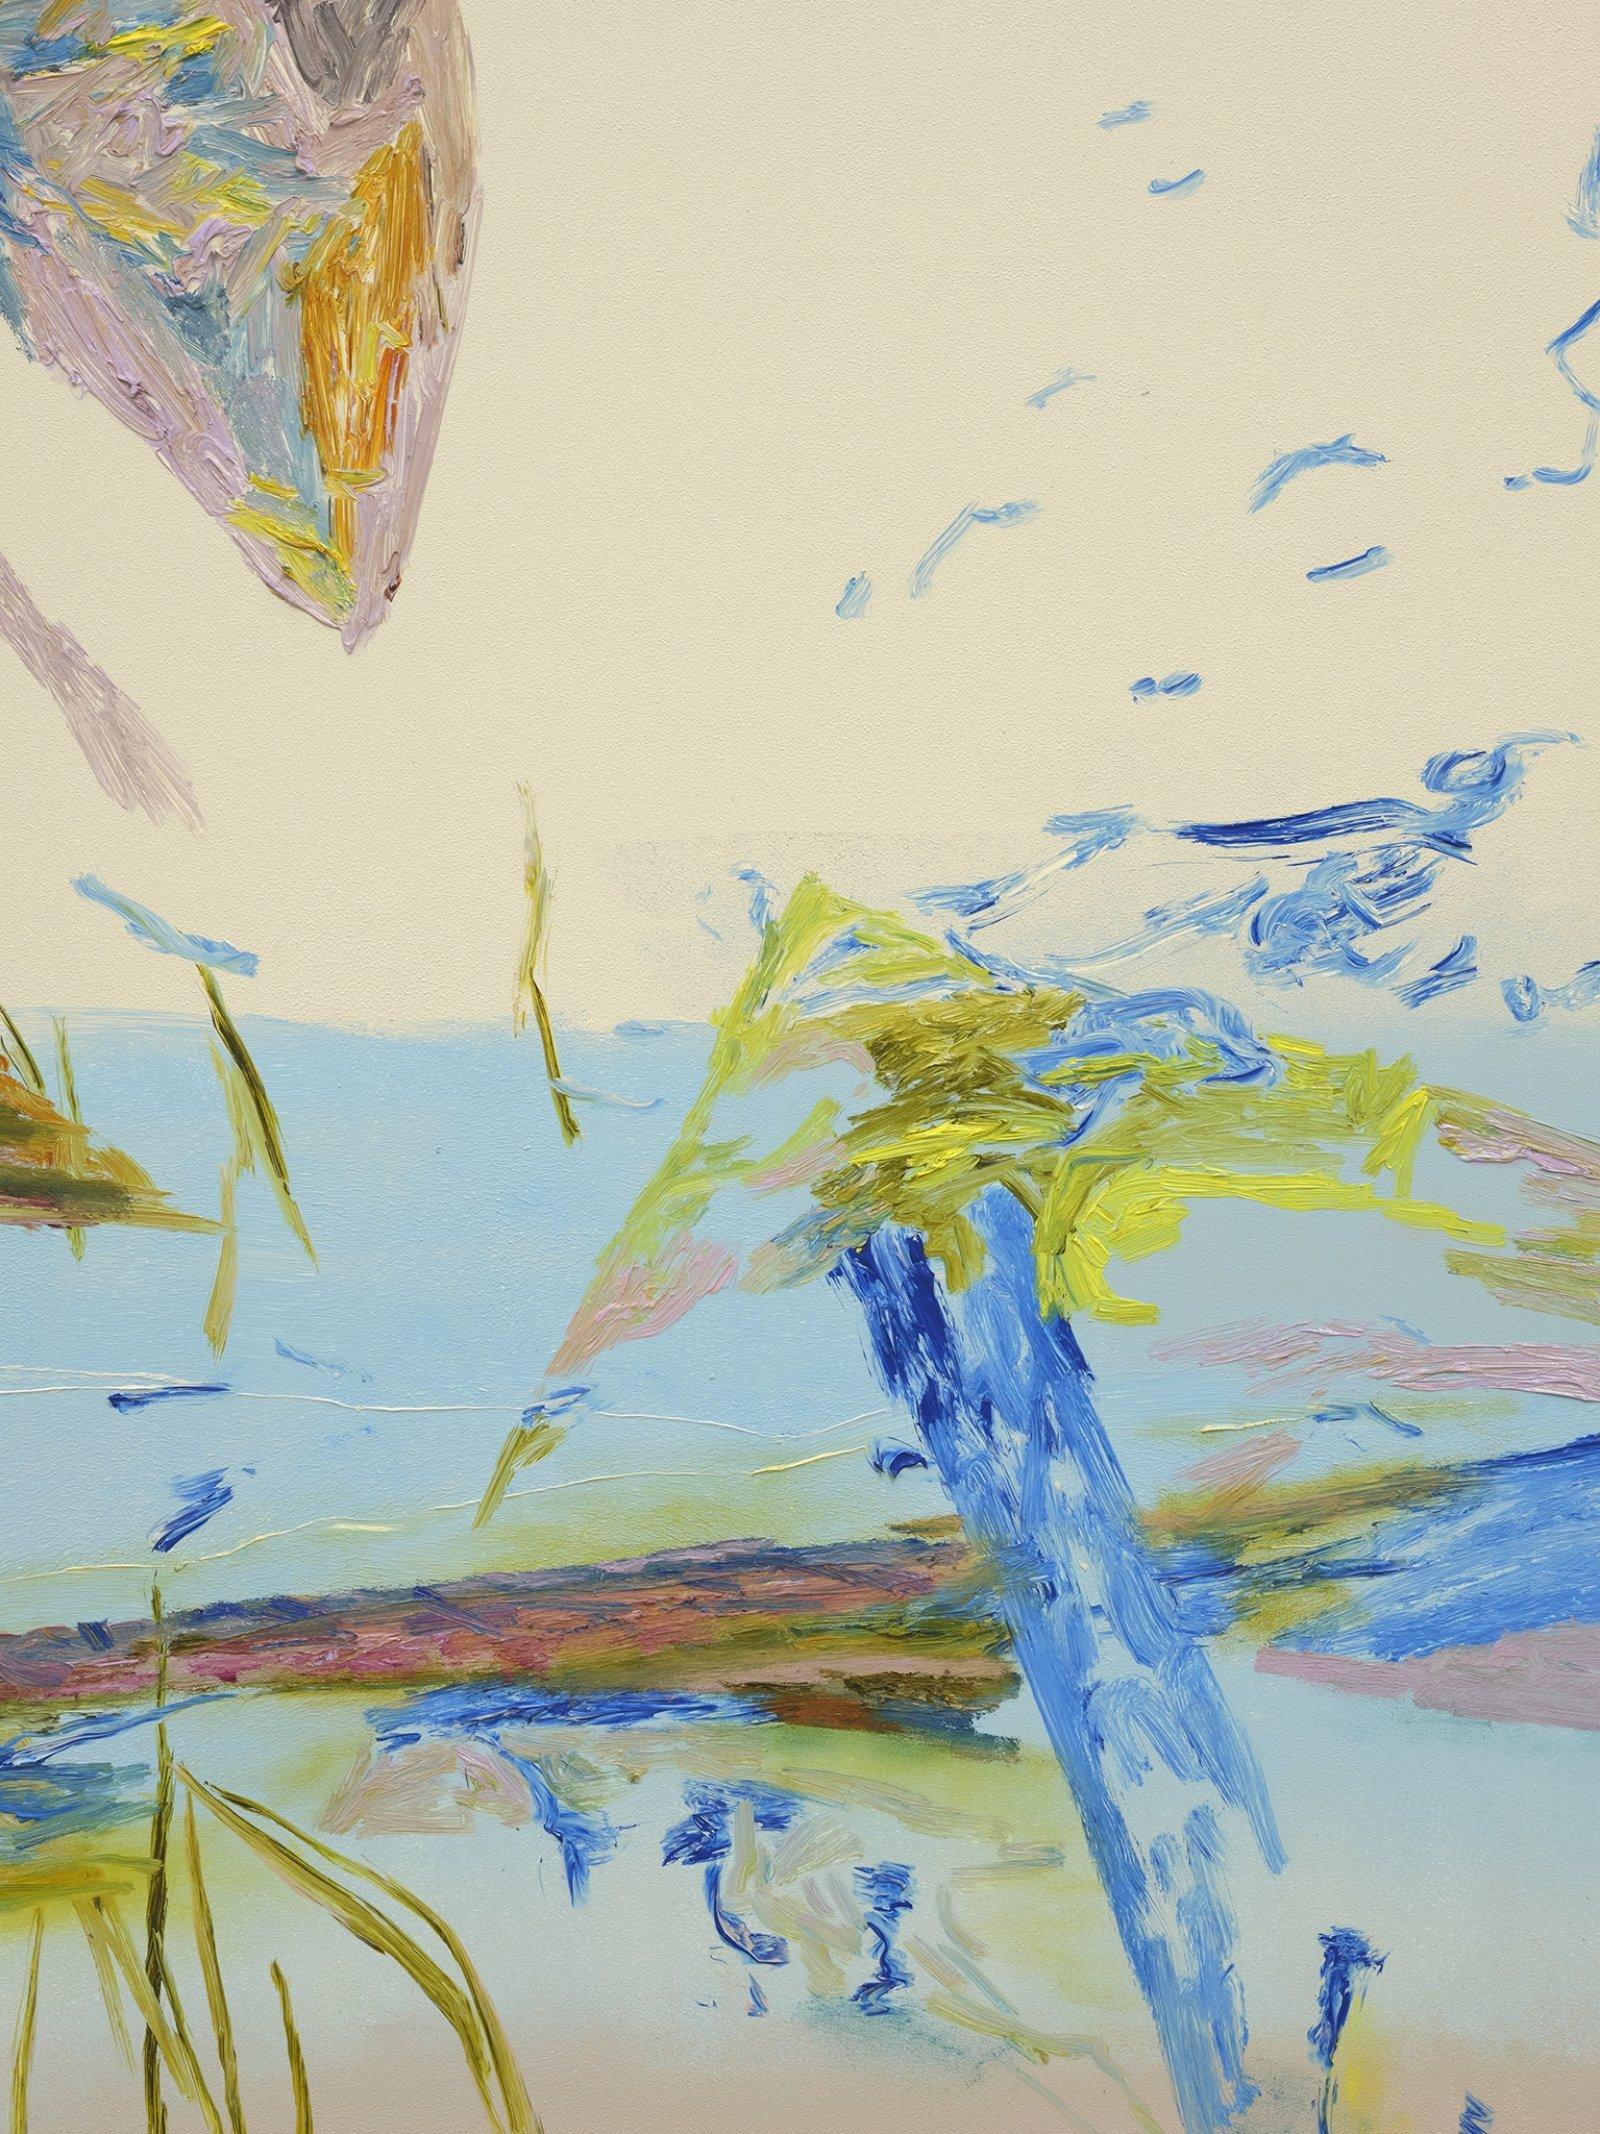 Rebecca Brewer, Makena Beach (detail), 1984, 2019, oil on wood panel, 60 x 57 in. (152 x 145 cm)